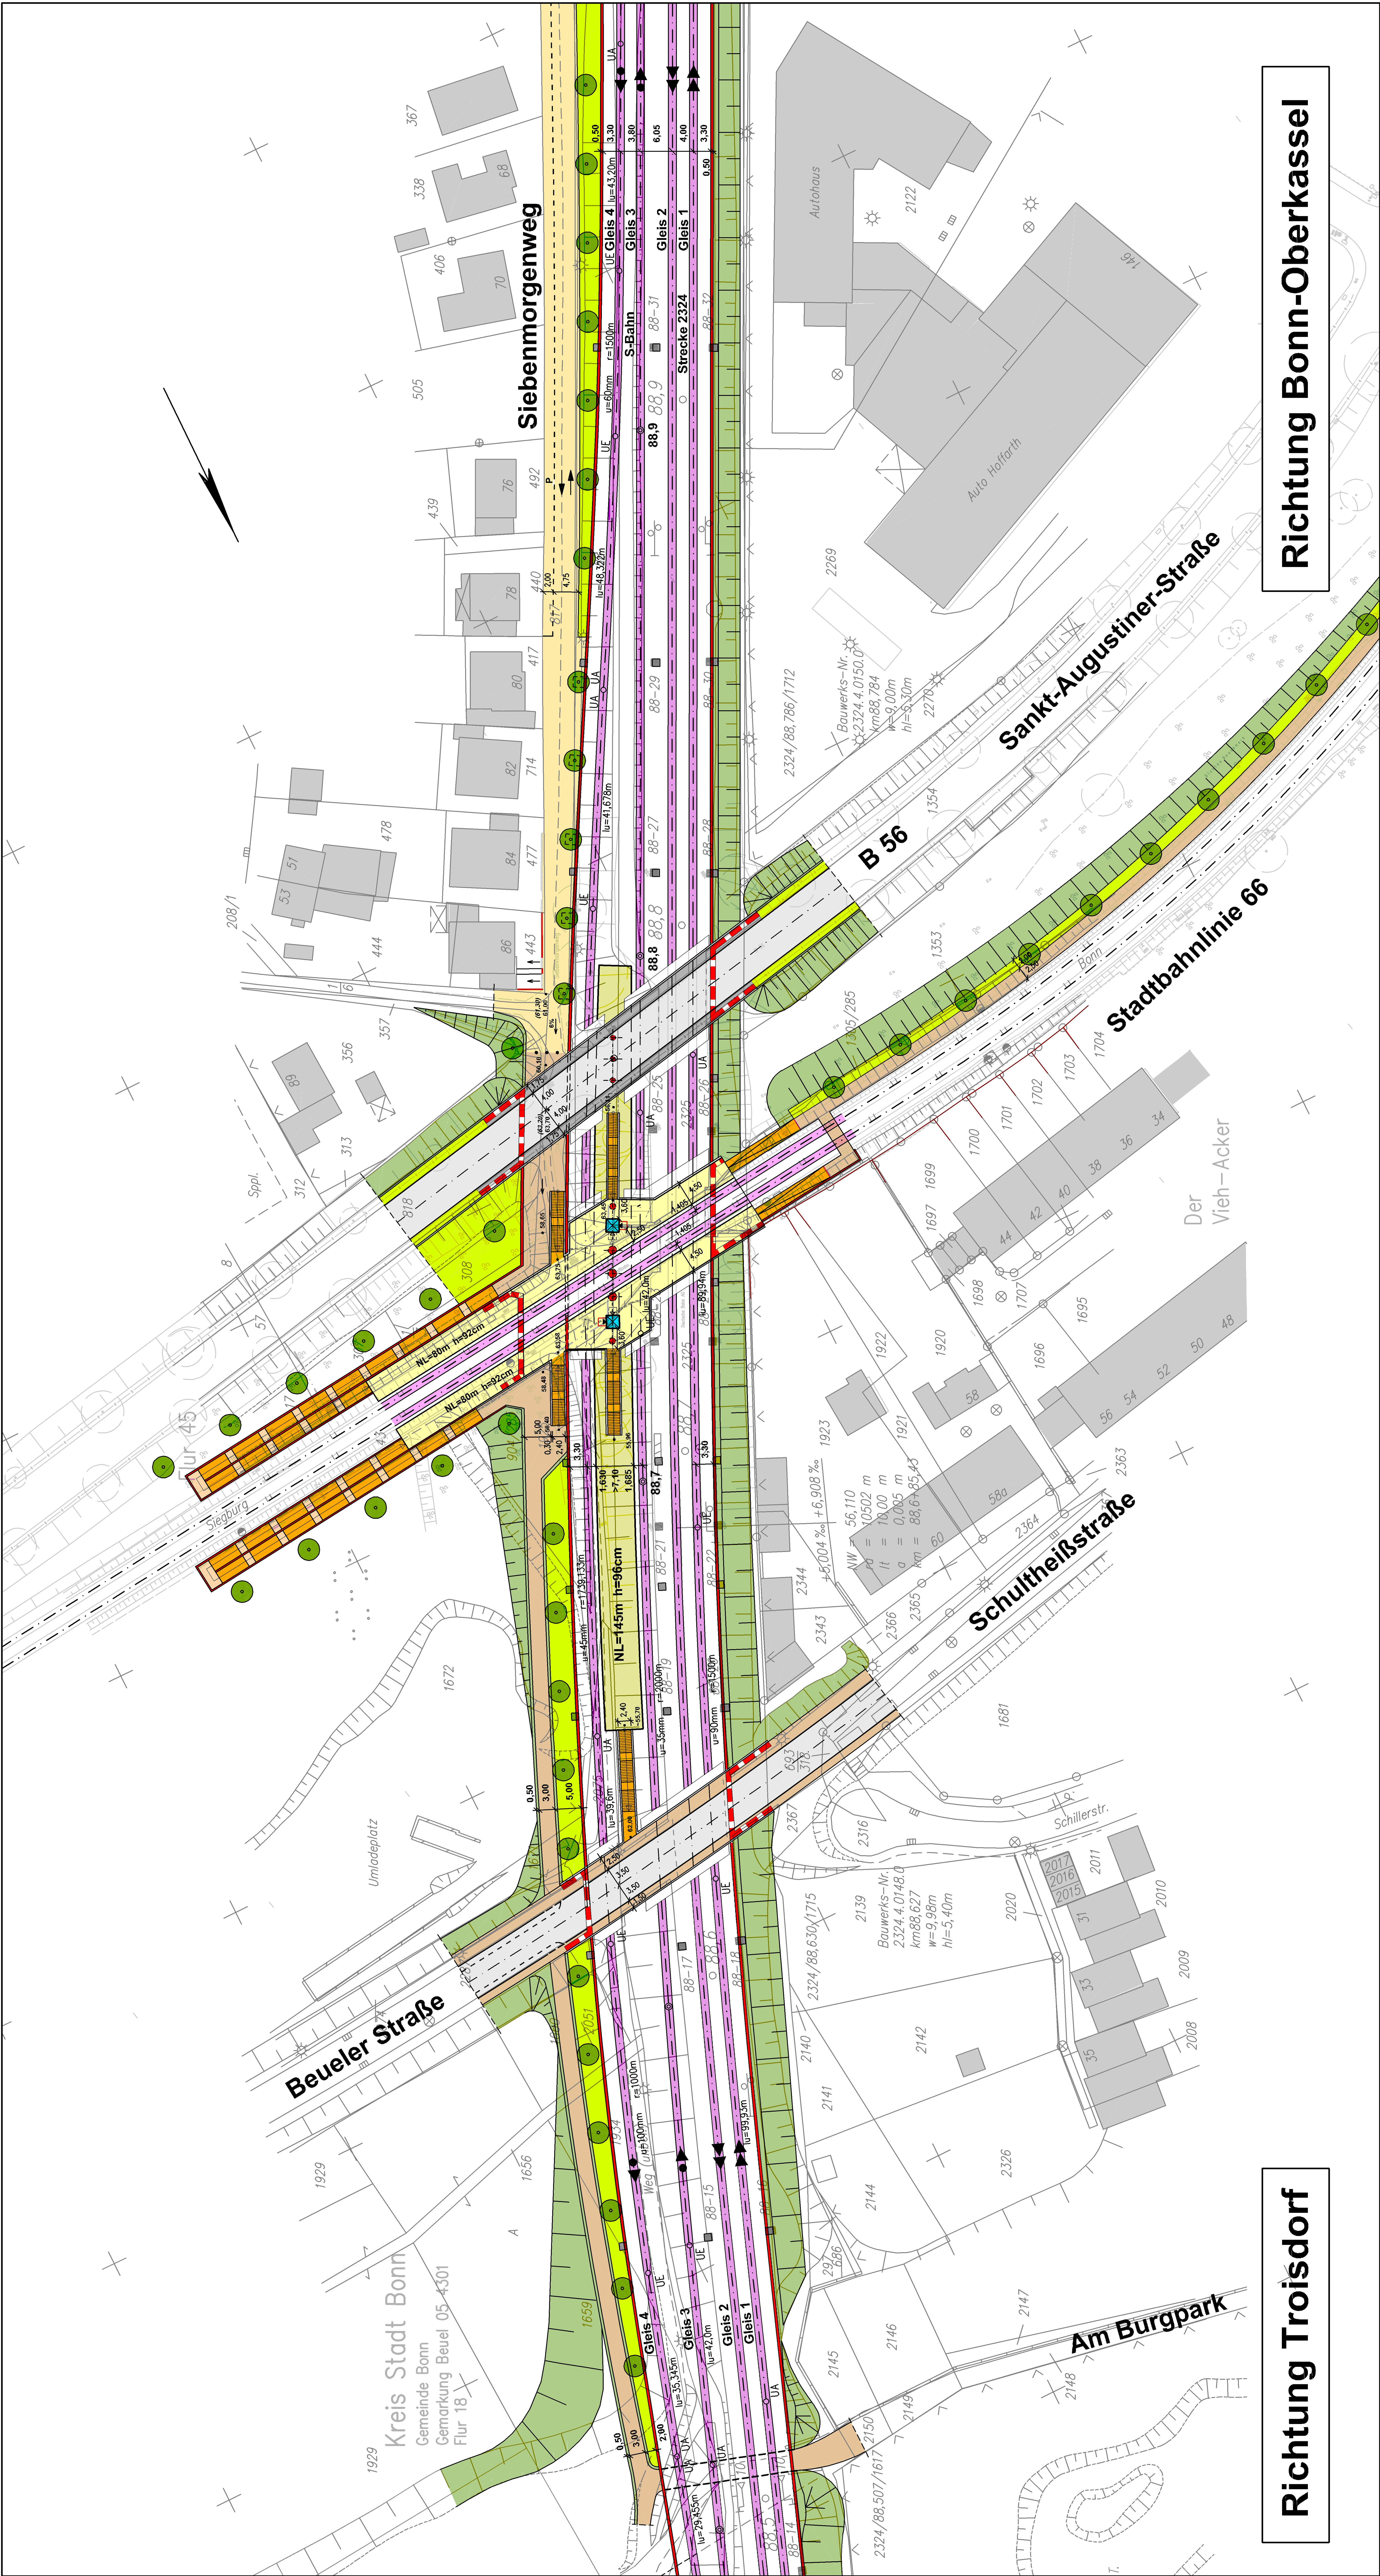 S13 Fahrplan Köln